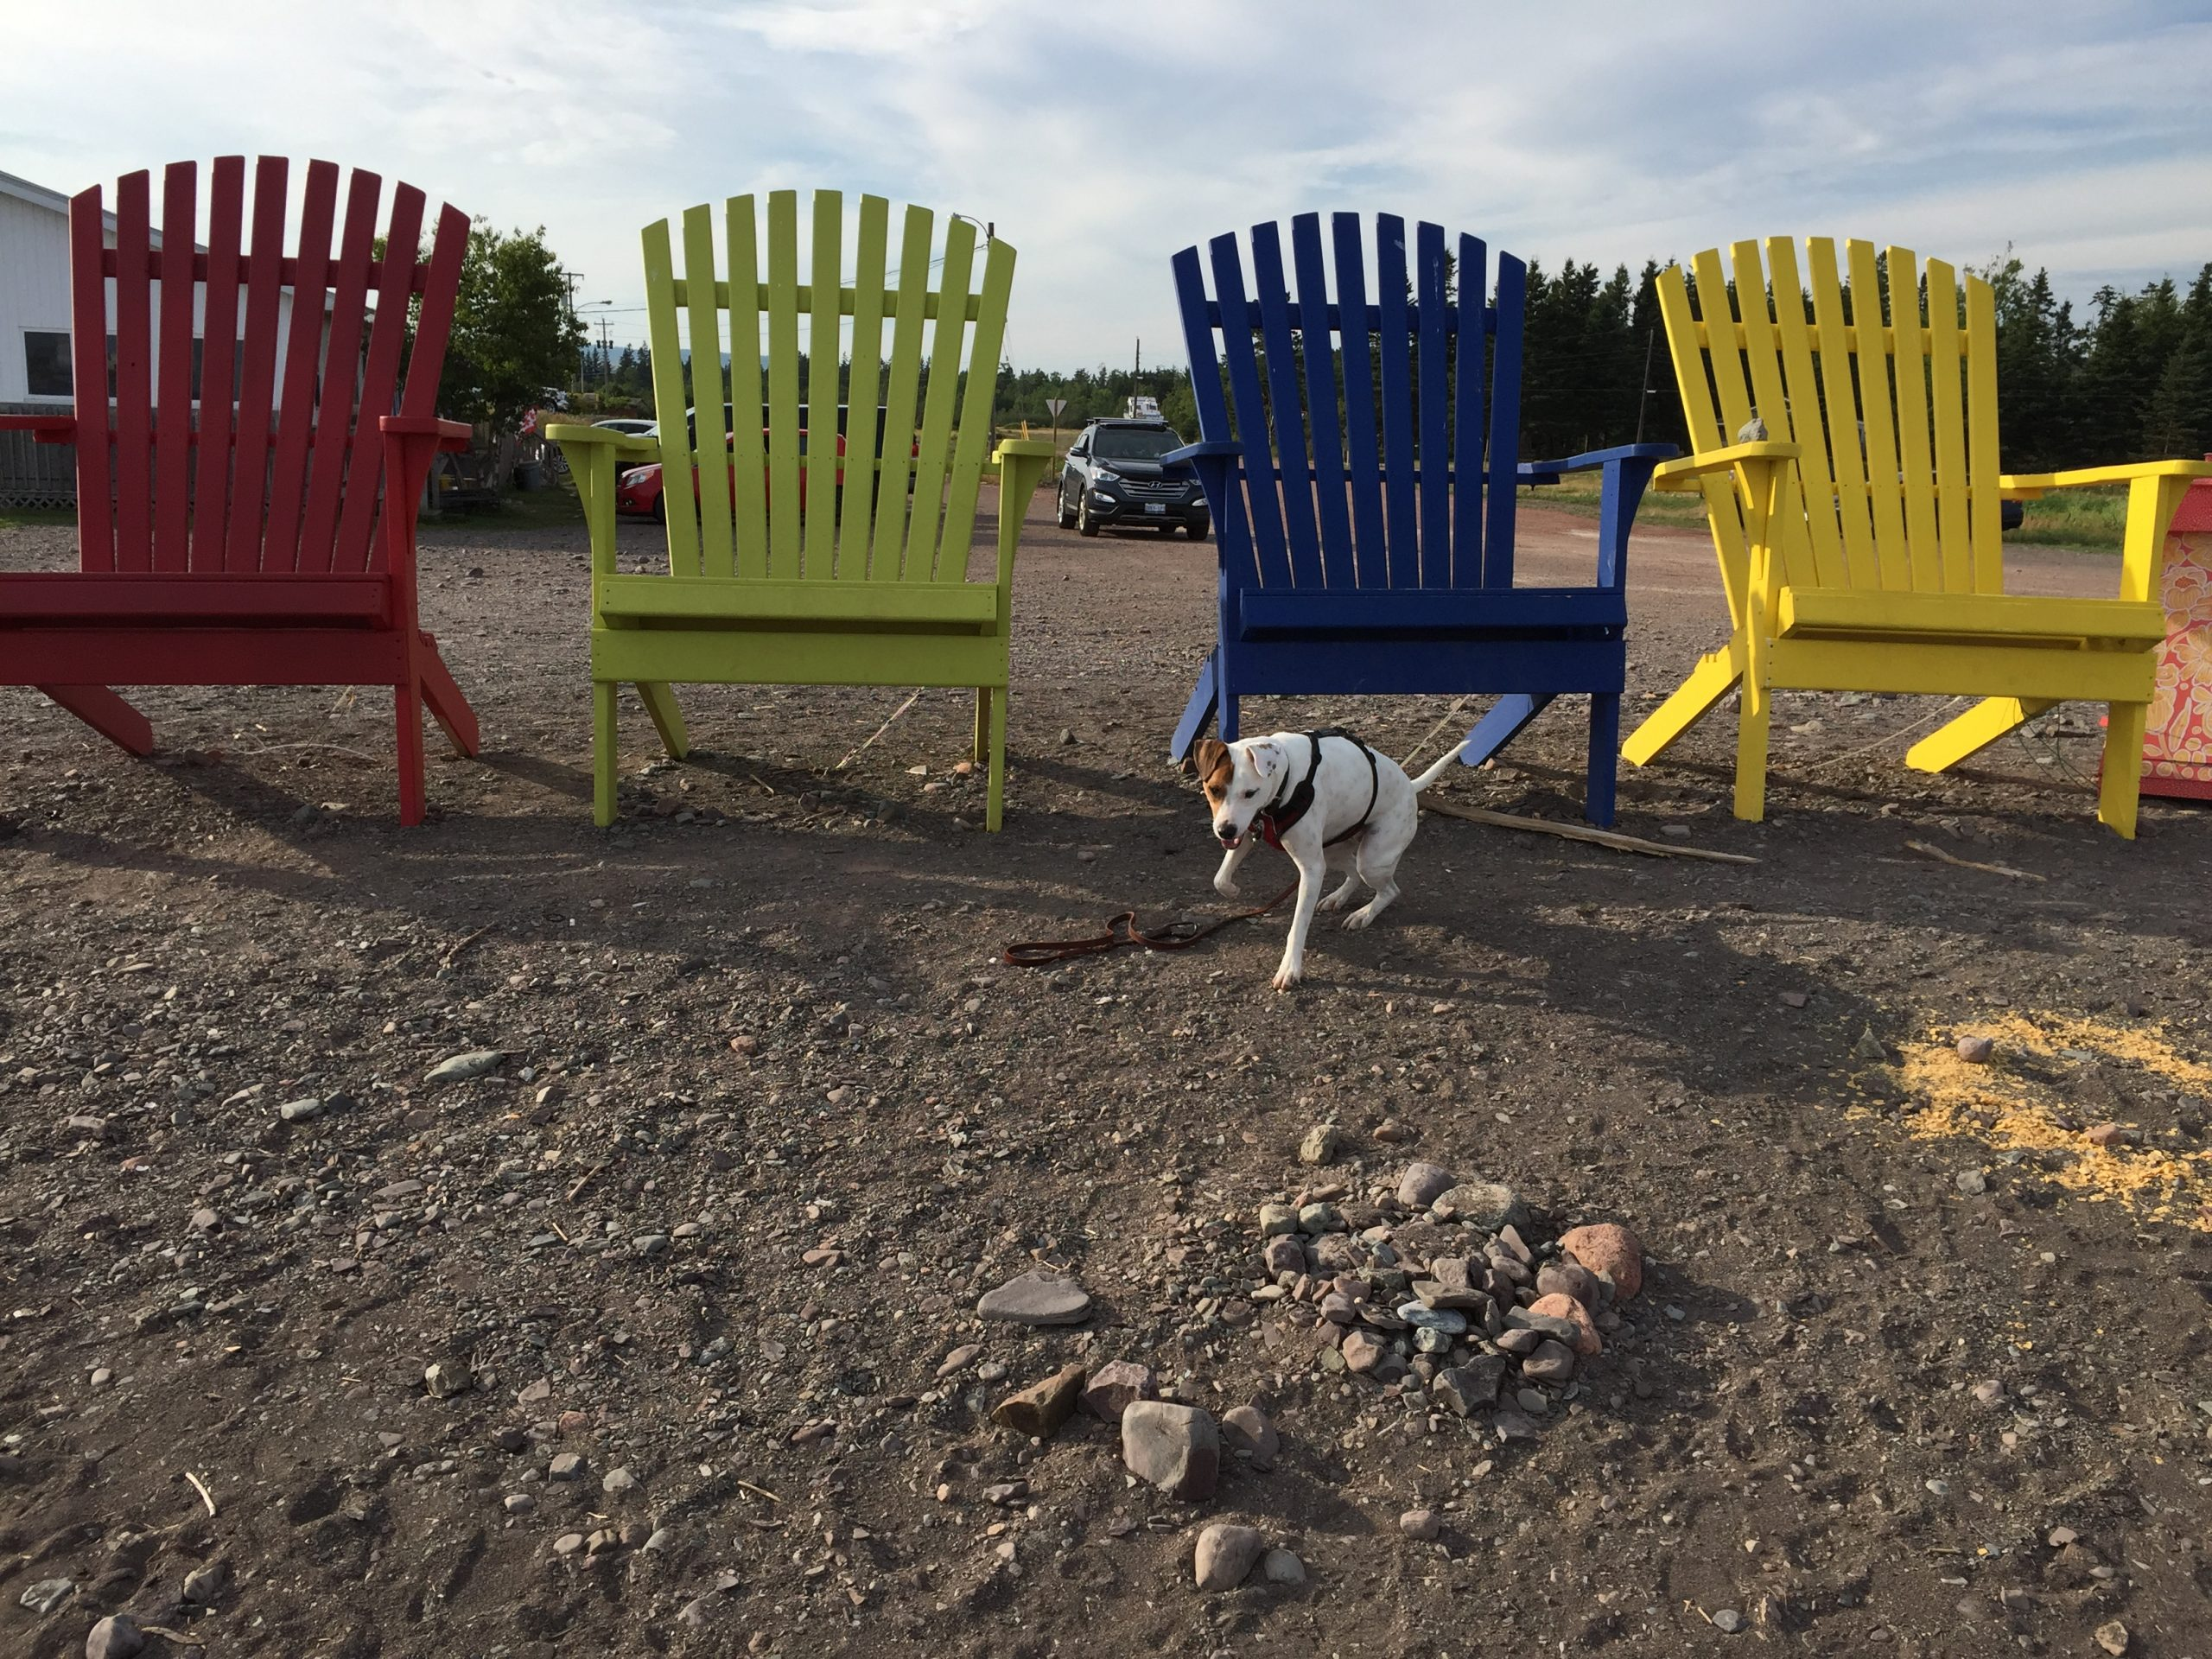 happy dog inspects giant beach chairs at Parrsboro, Nova Scotia